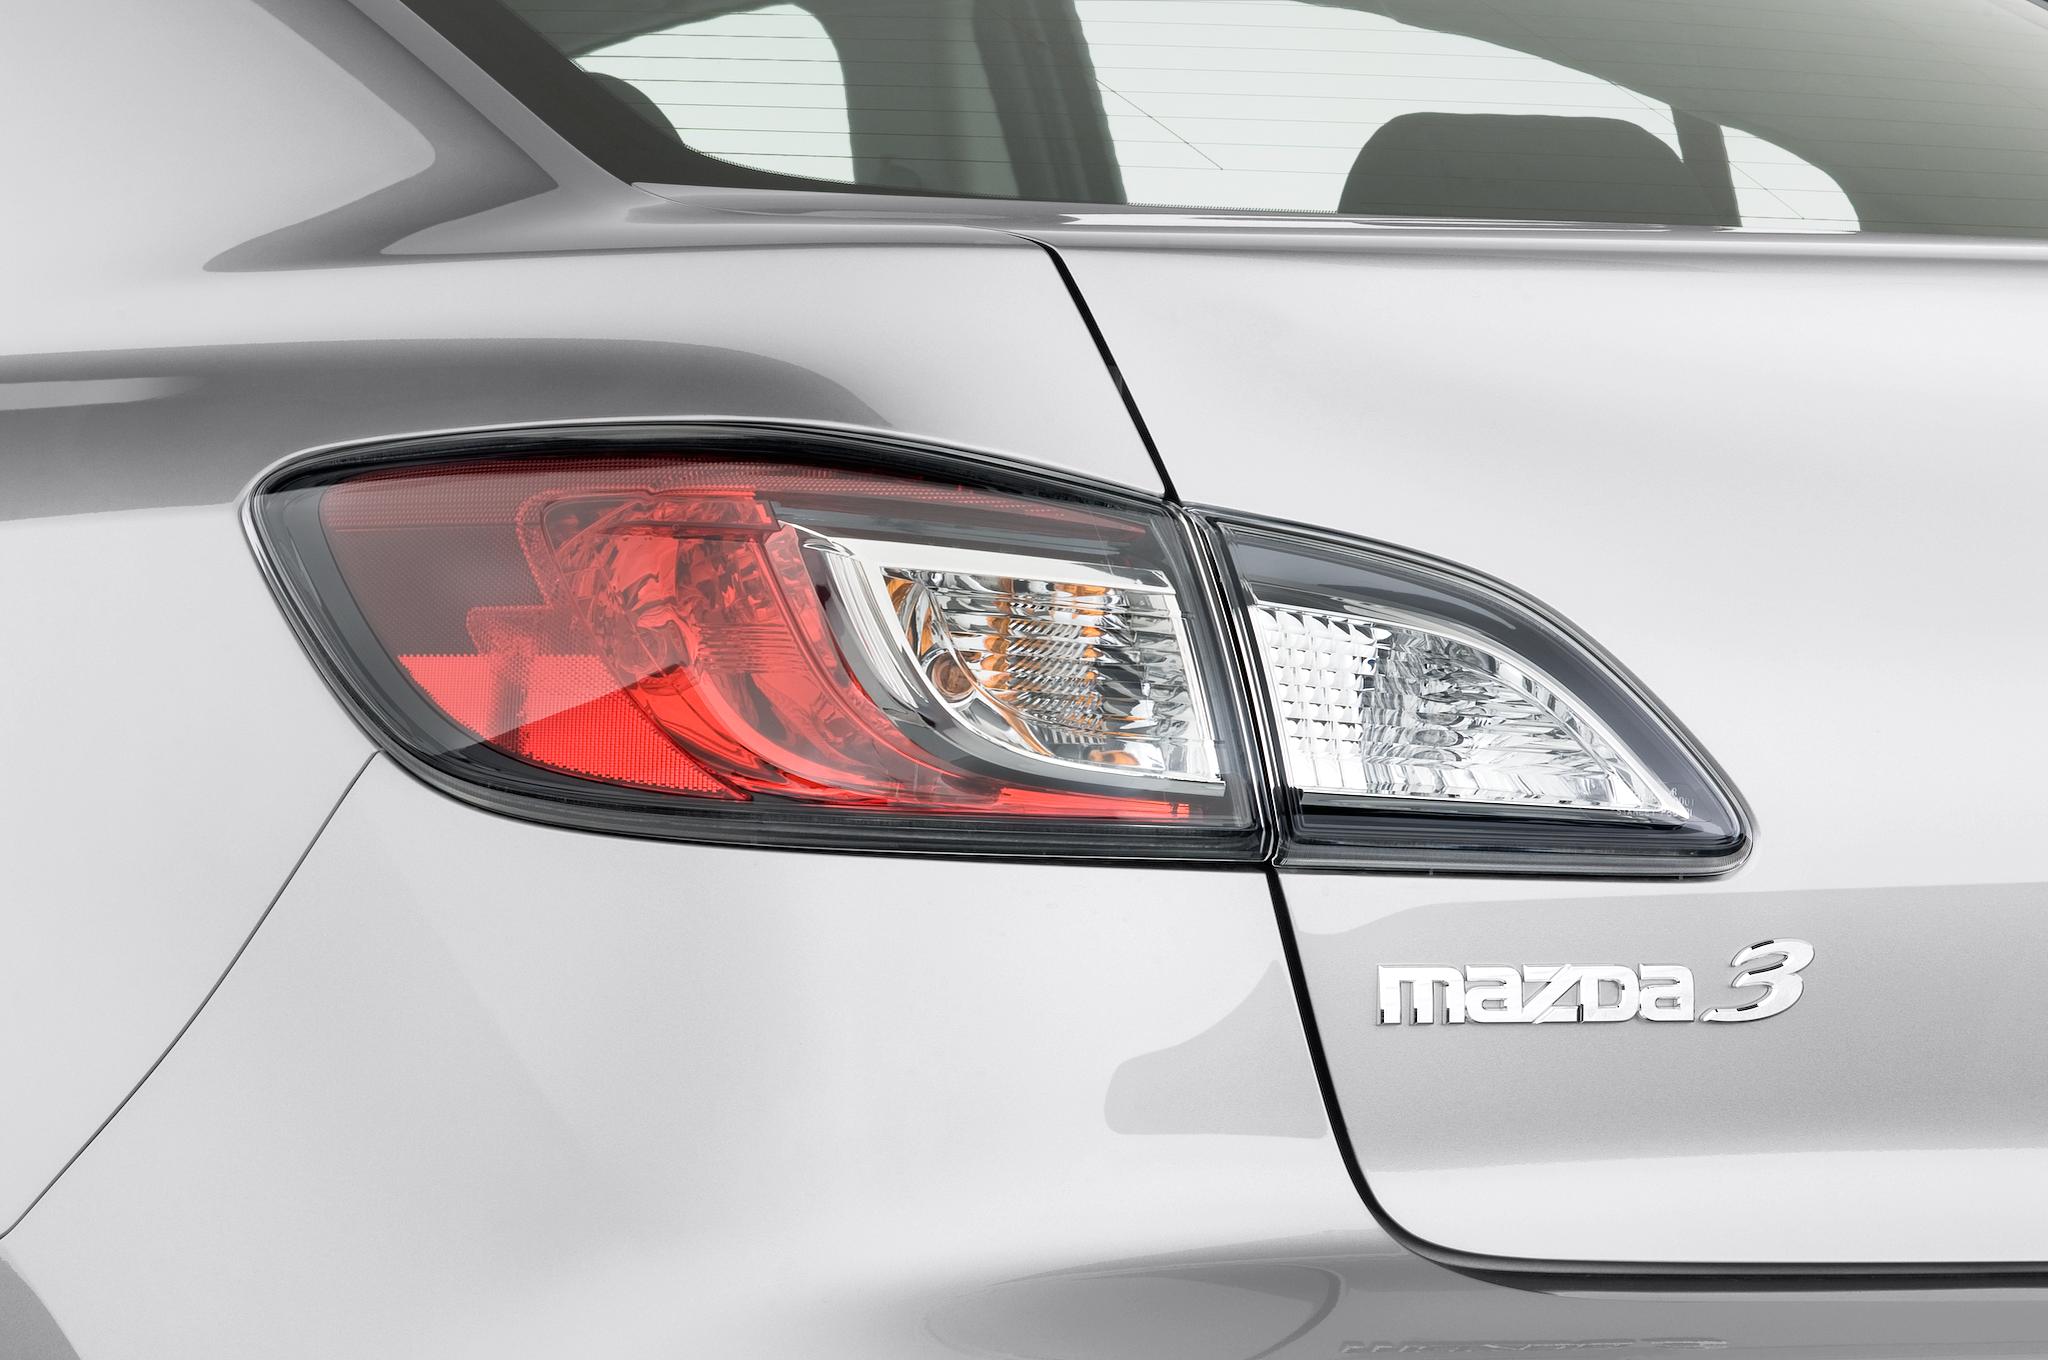 2010 Mazda 3 Mazda Hatchback Review Automobile Magazine